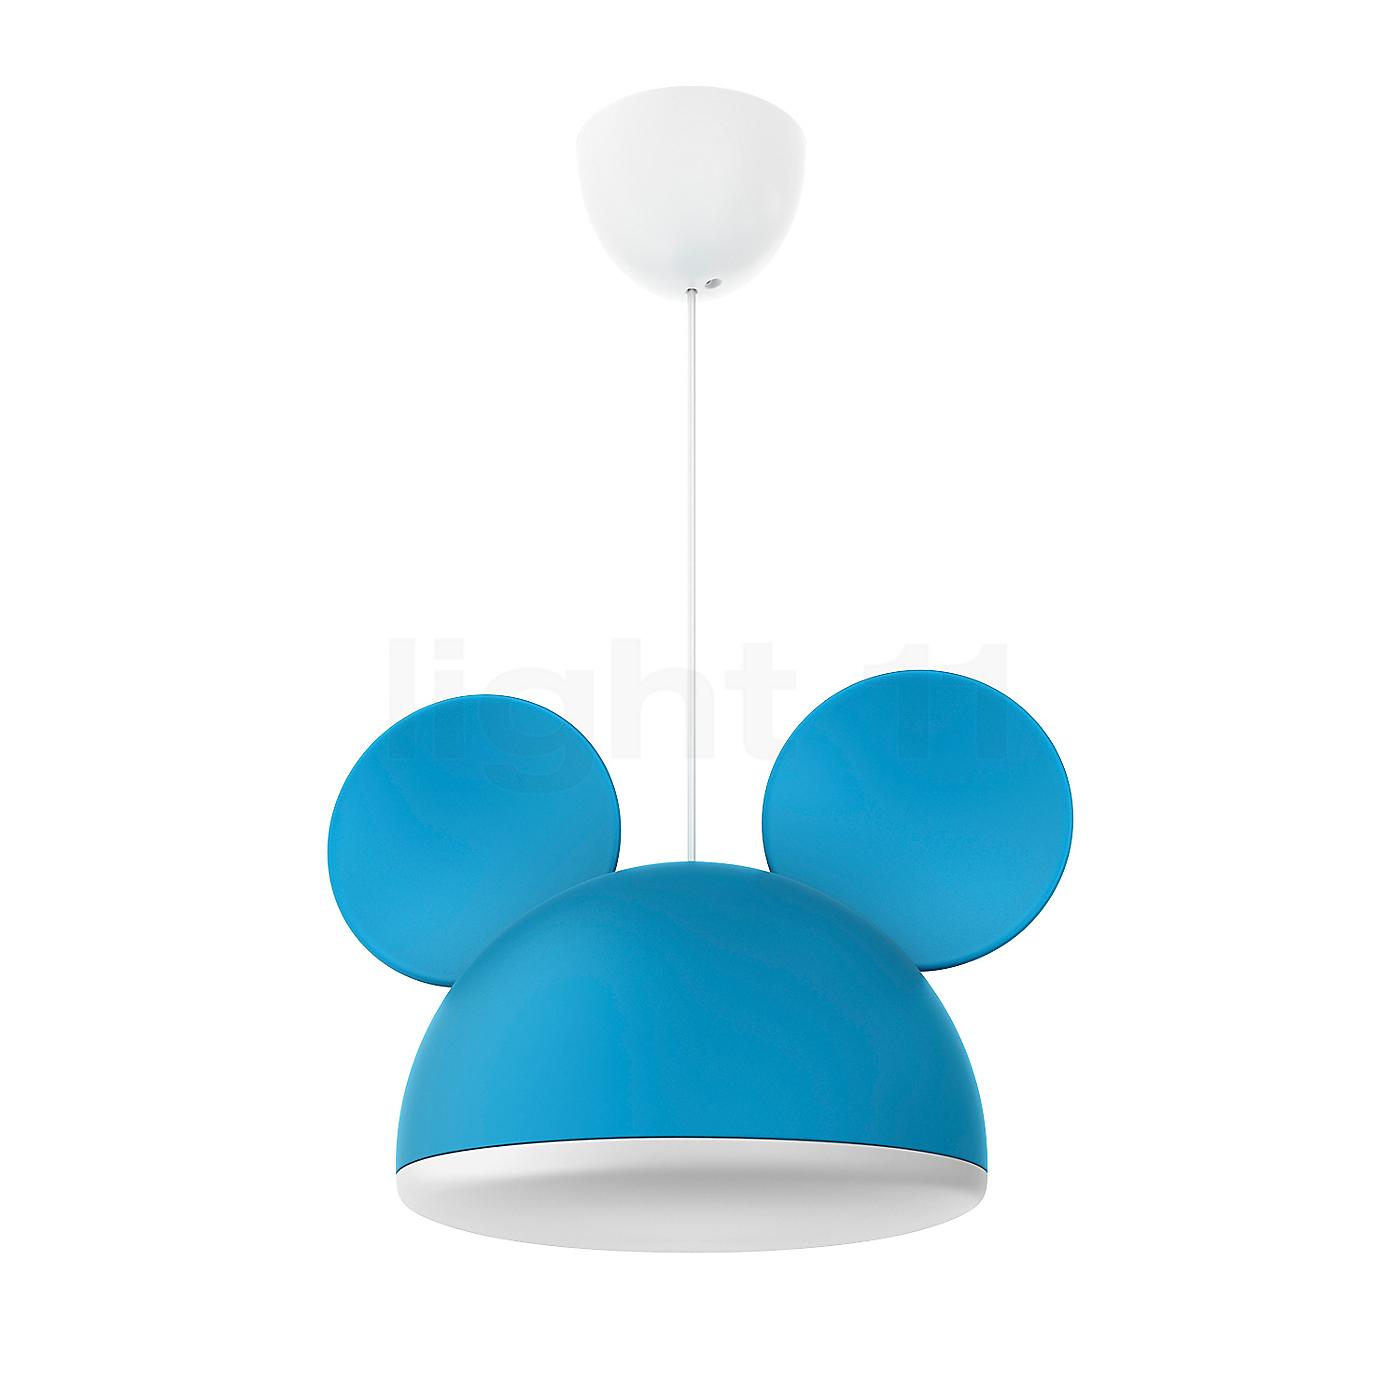 philips disney pendelleuchte micky maus blau pendelleuchte. Black Bedroom Furniture Sets. Home Design Ideas